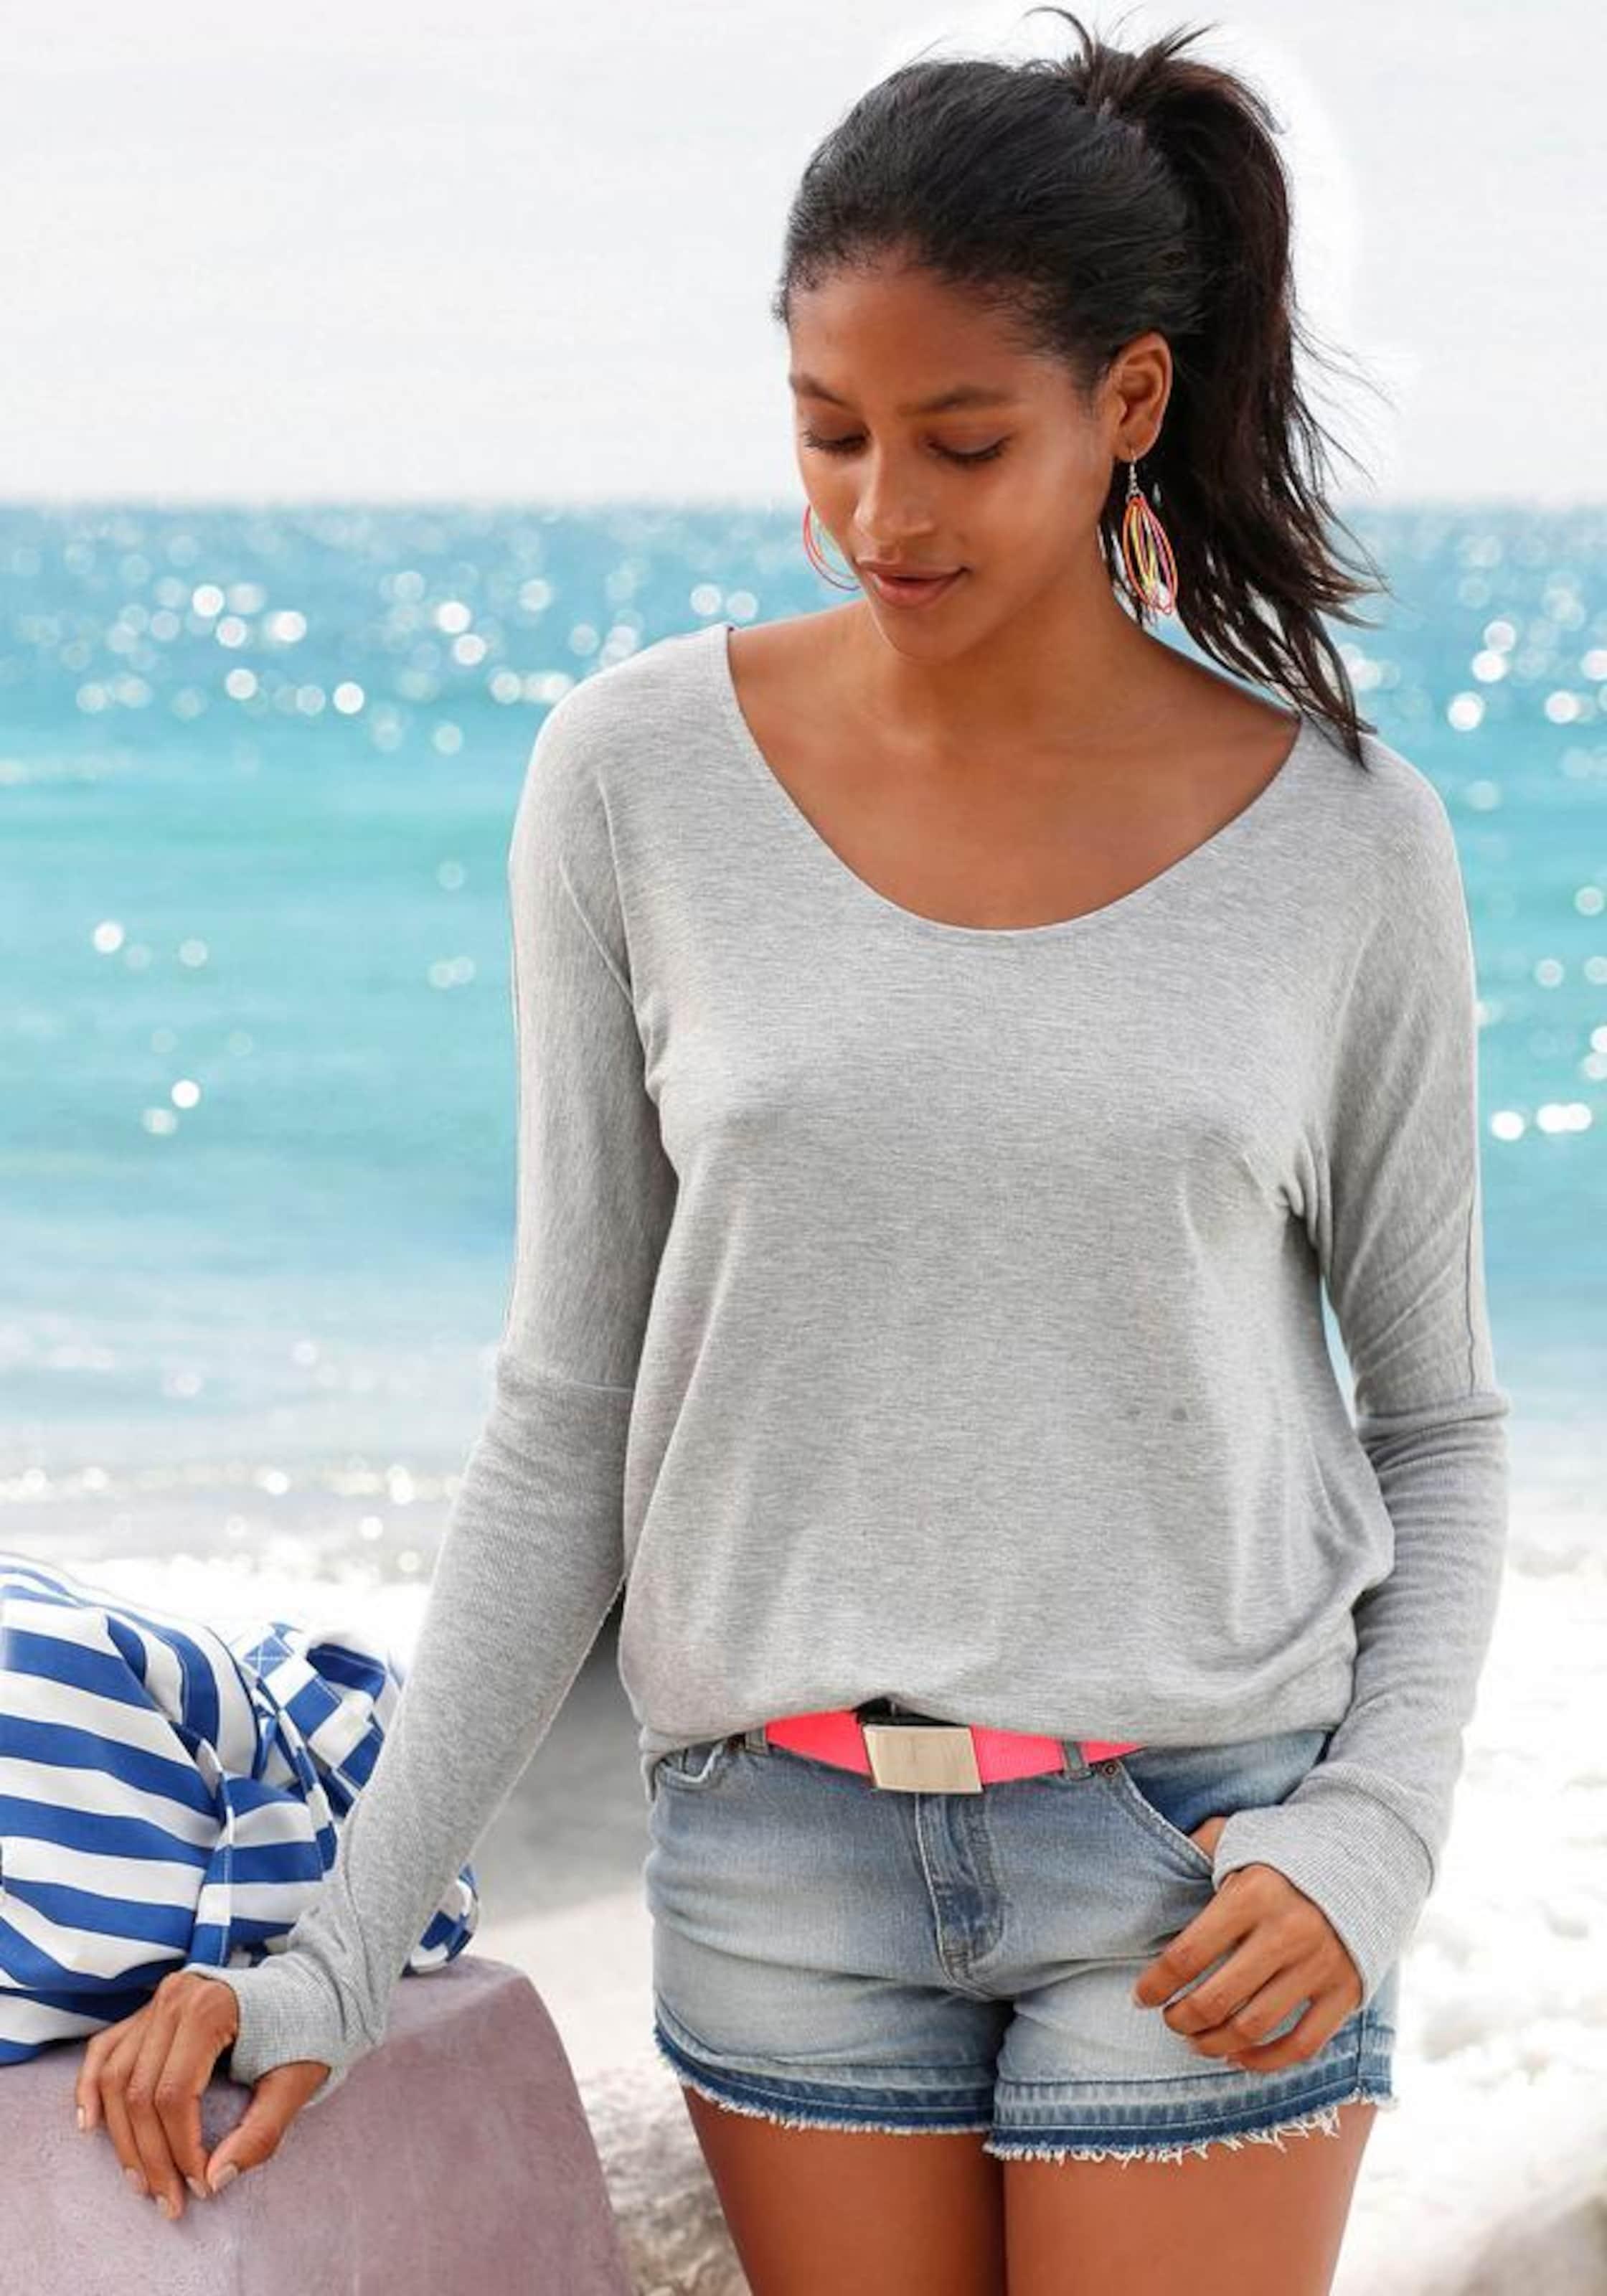 tiefem mit Strandshirt Strandshirt R眉ckenausschnitt BENCH mit BENCH v6yWgy0